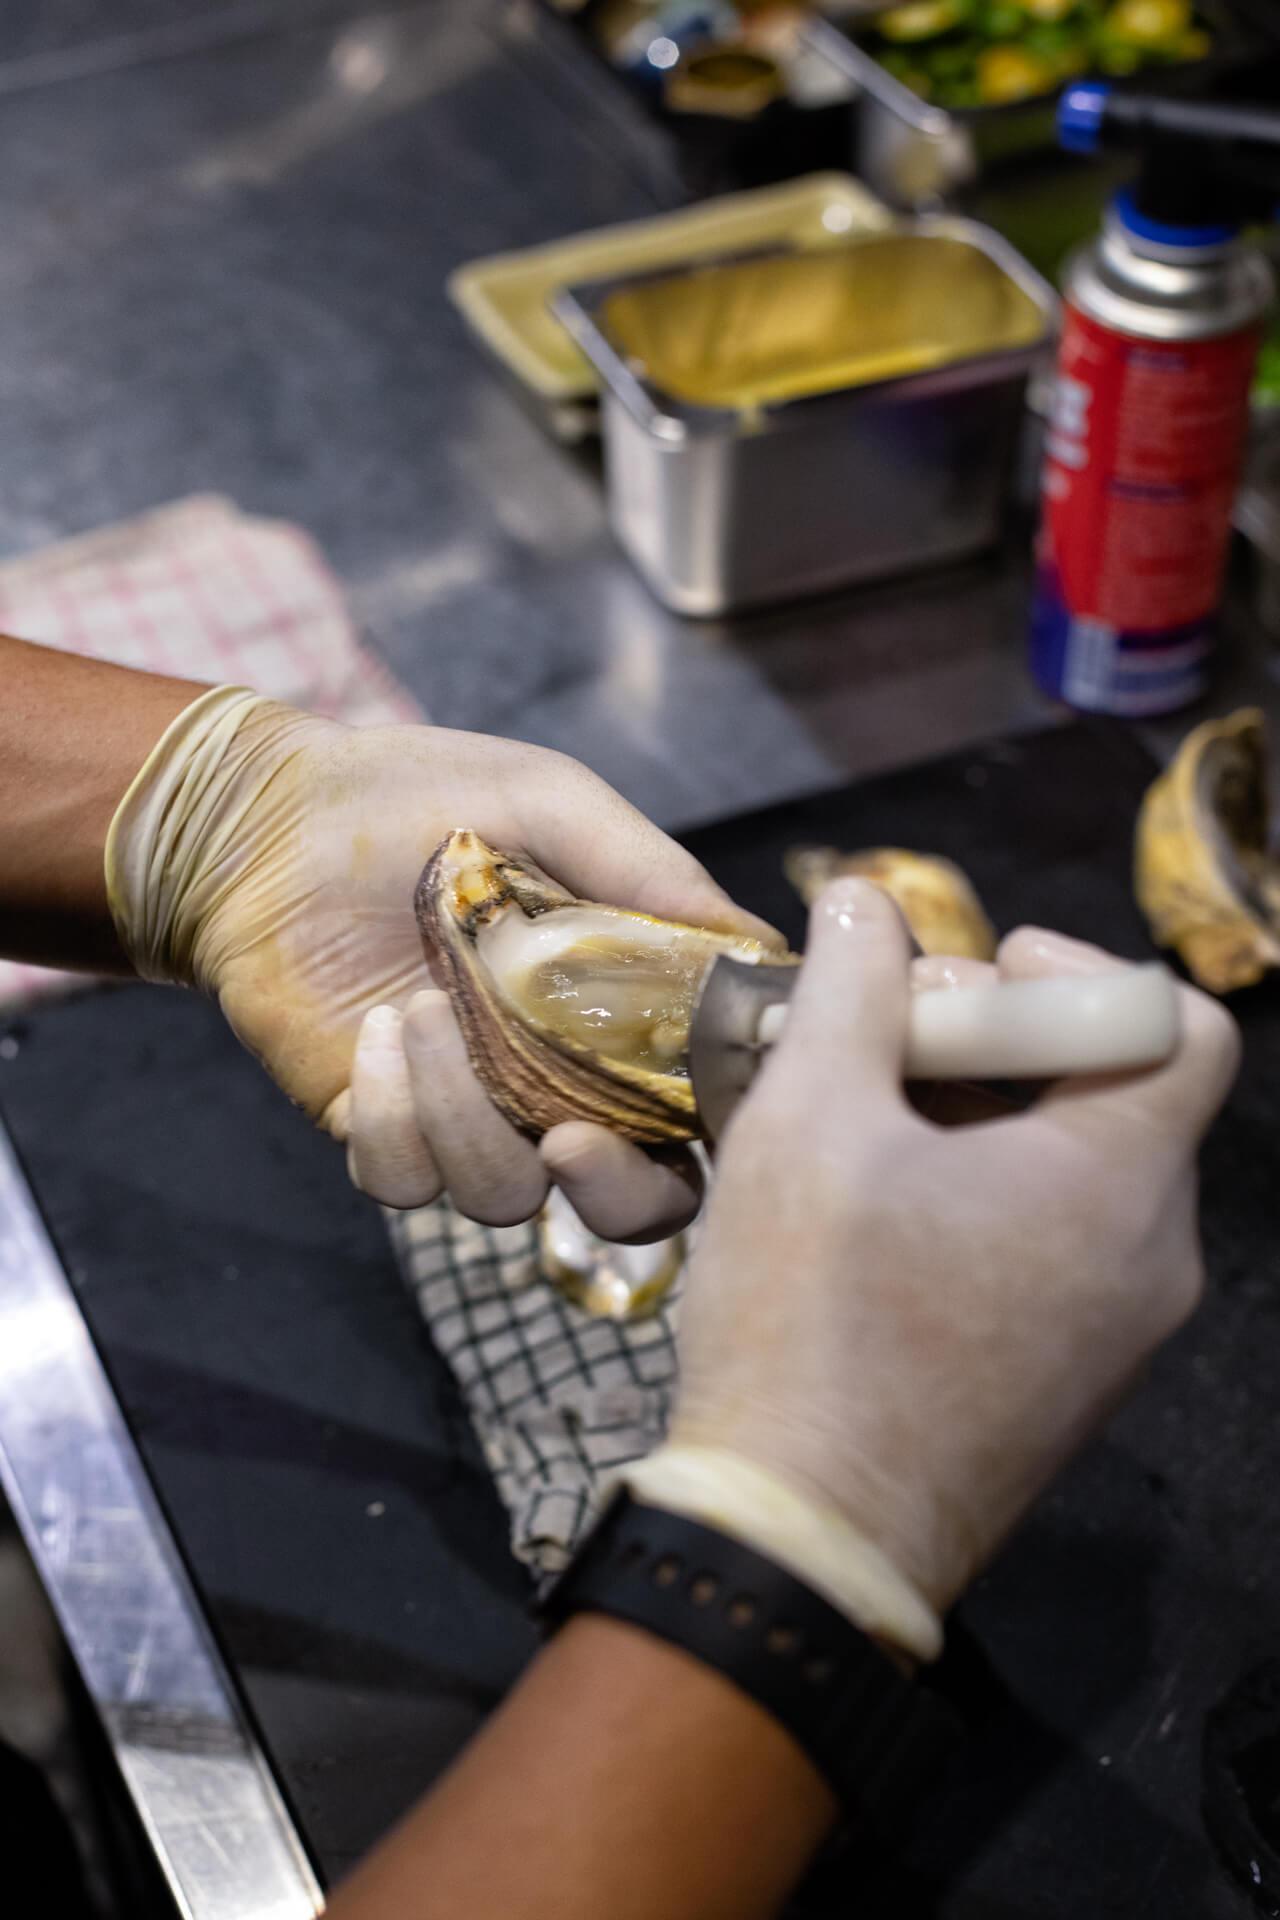 A worker shucking oysters at Wantusawa